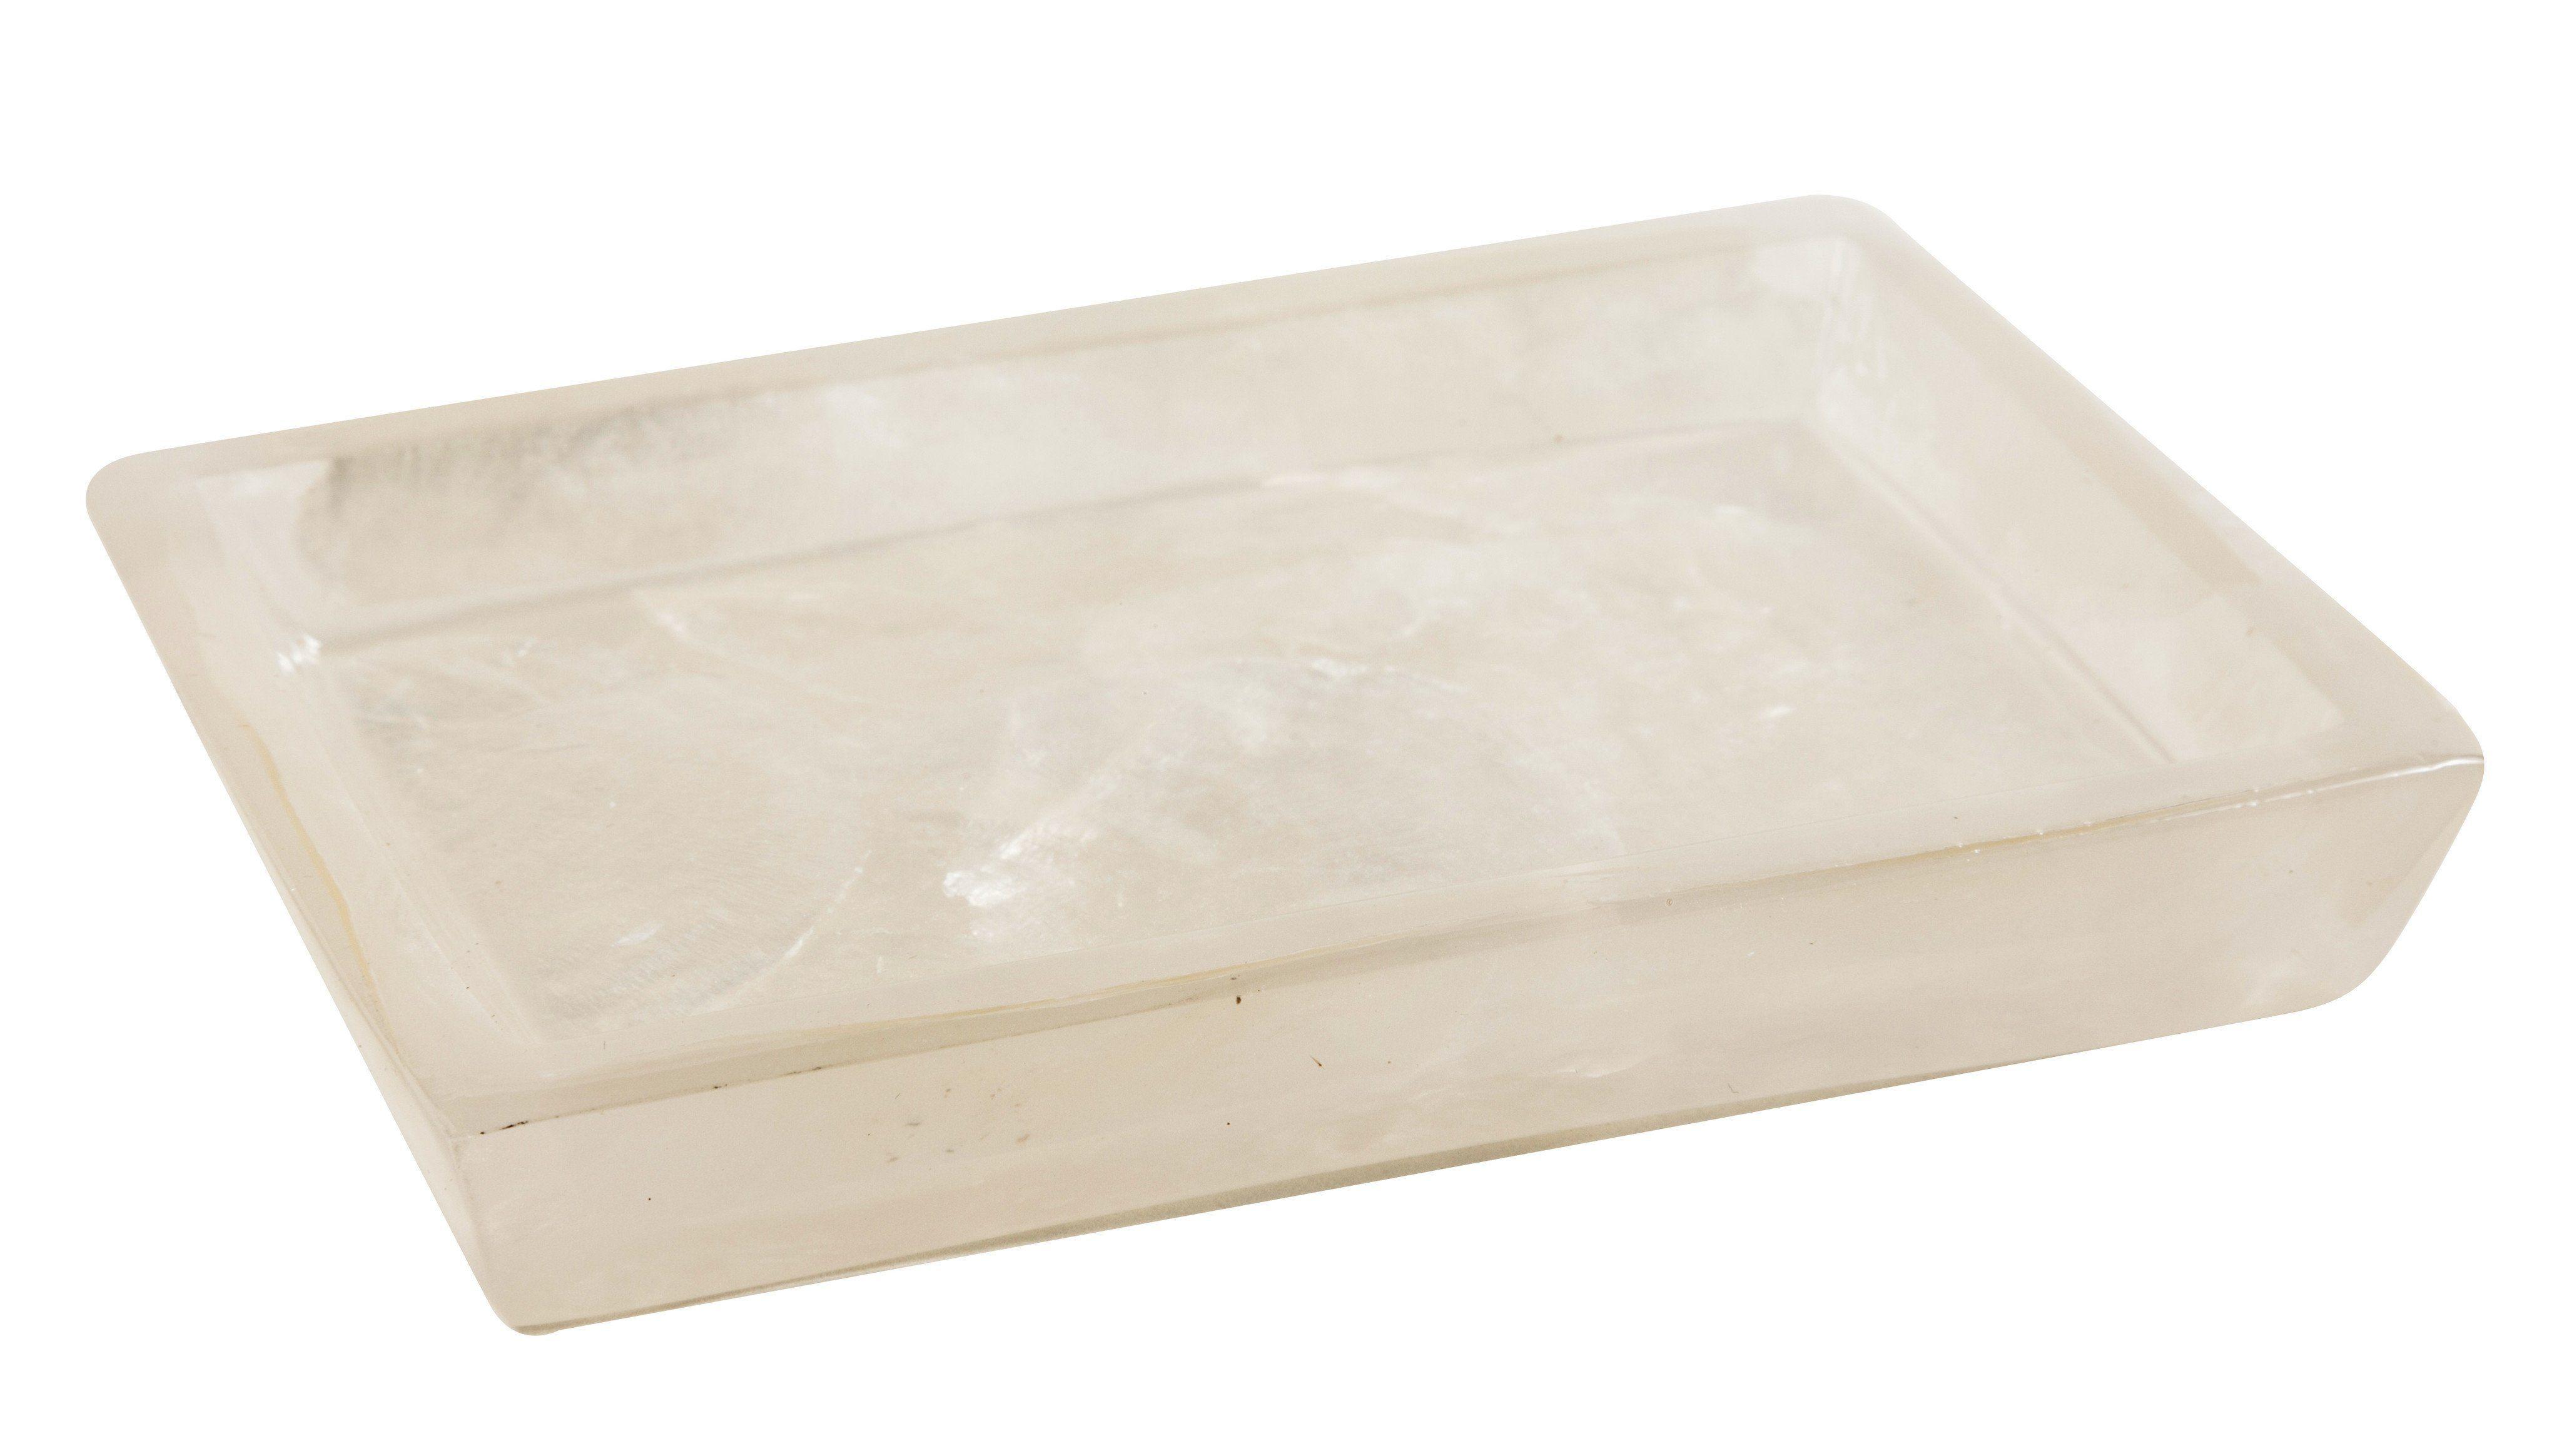 CP Perla Rectangular Soap Dish Holder Tray Soap Holder, Mother of Pearl, Resin